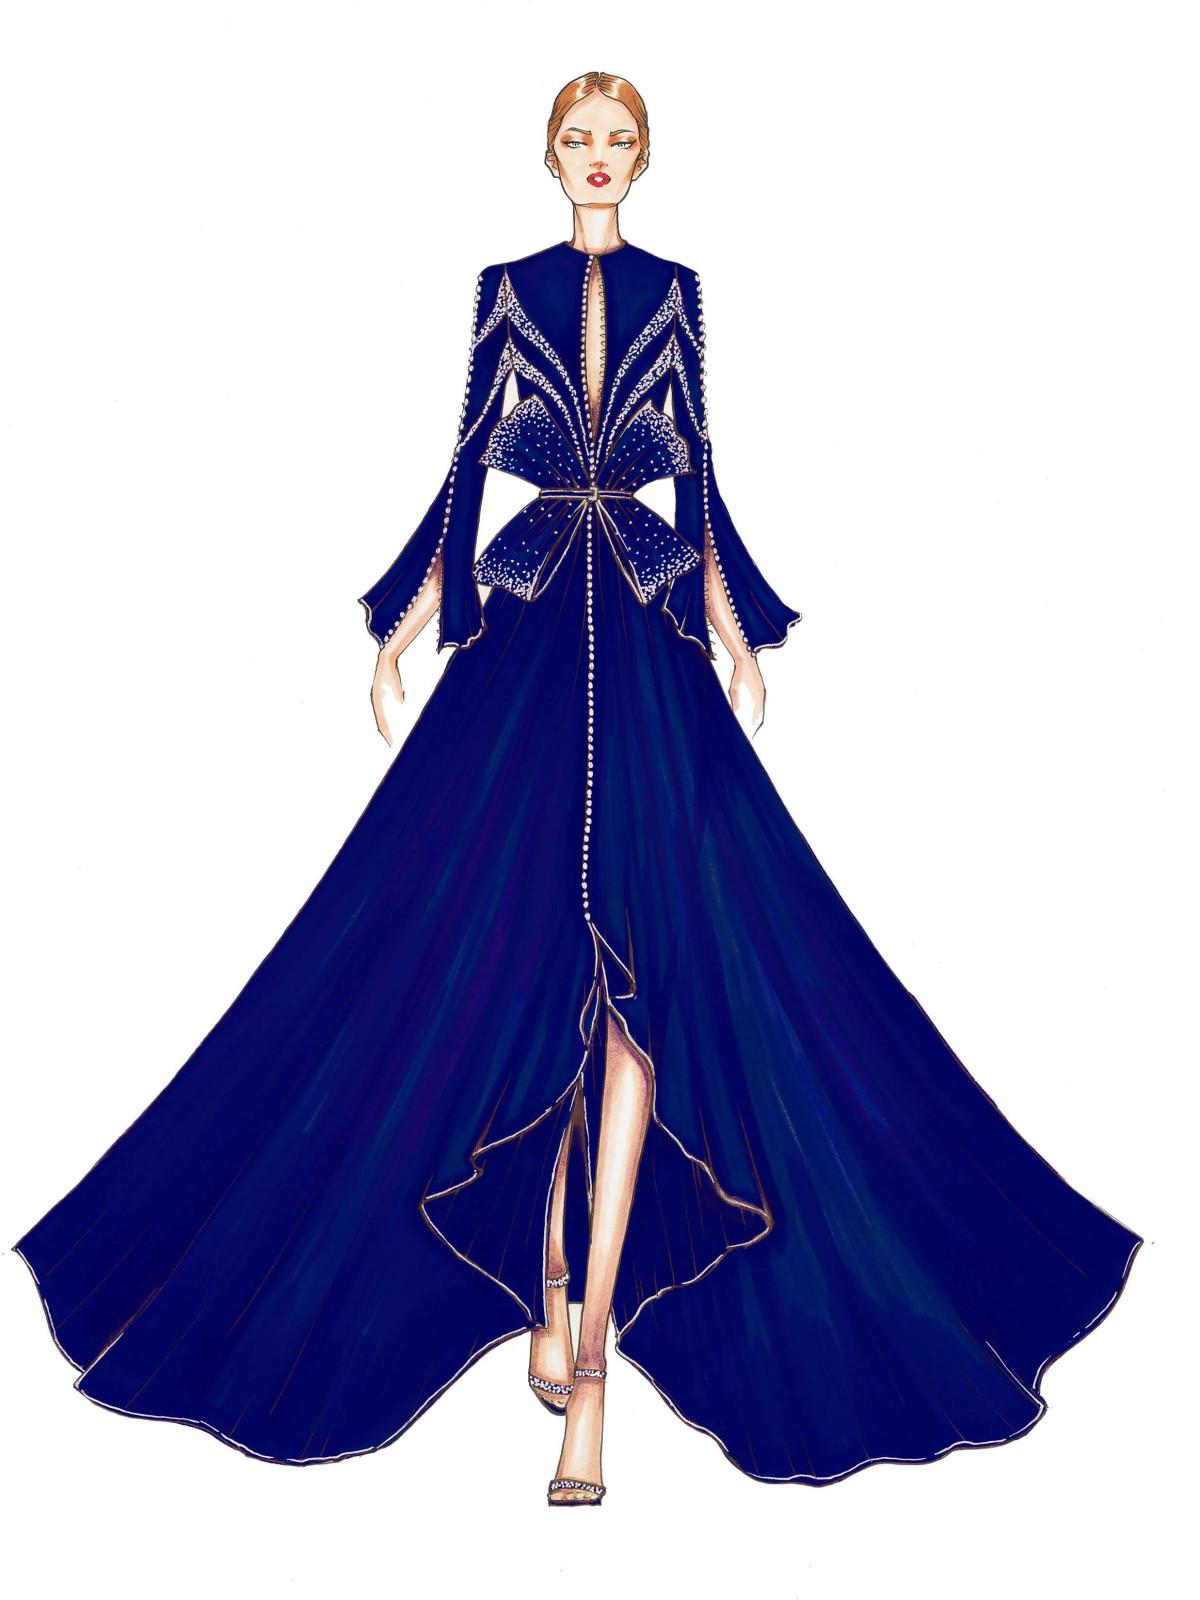 Designer Inspirations Reflect New York Fashion Week S Dual Personality Culturemap Houston